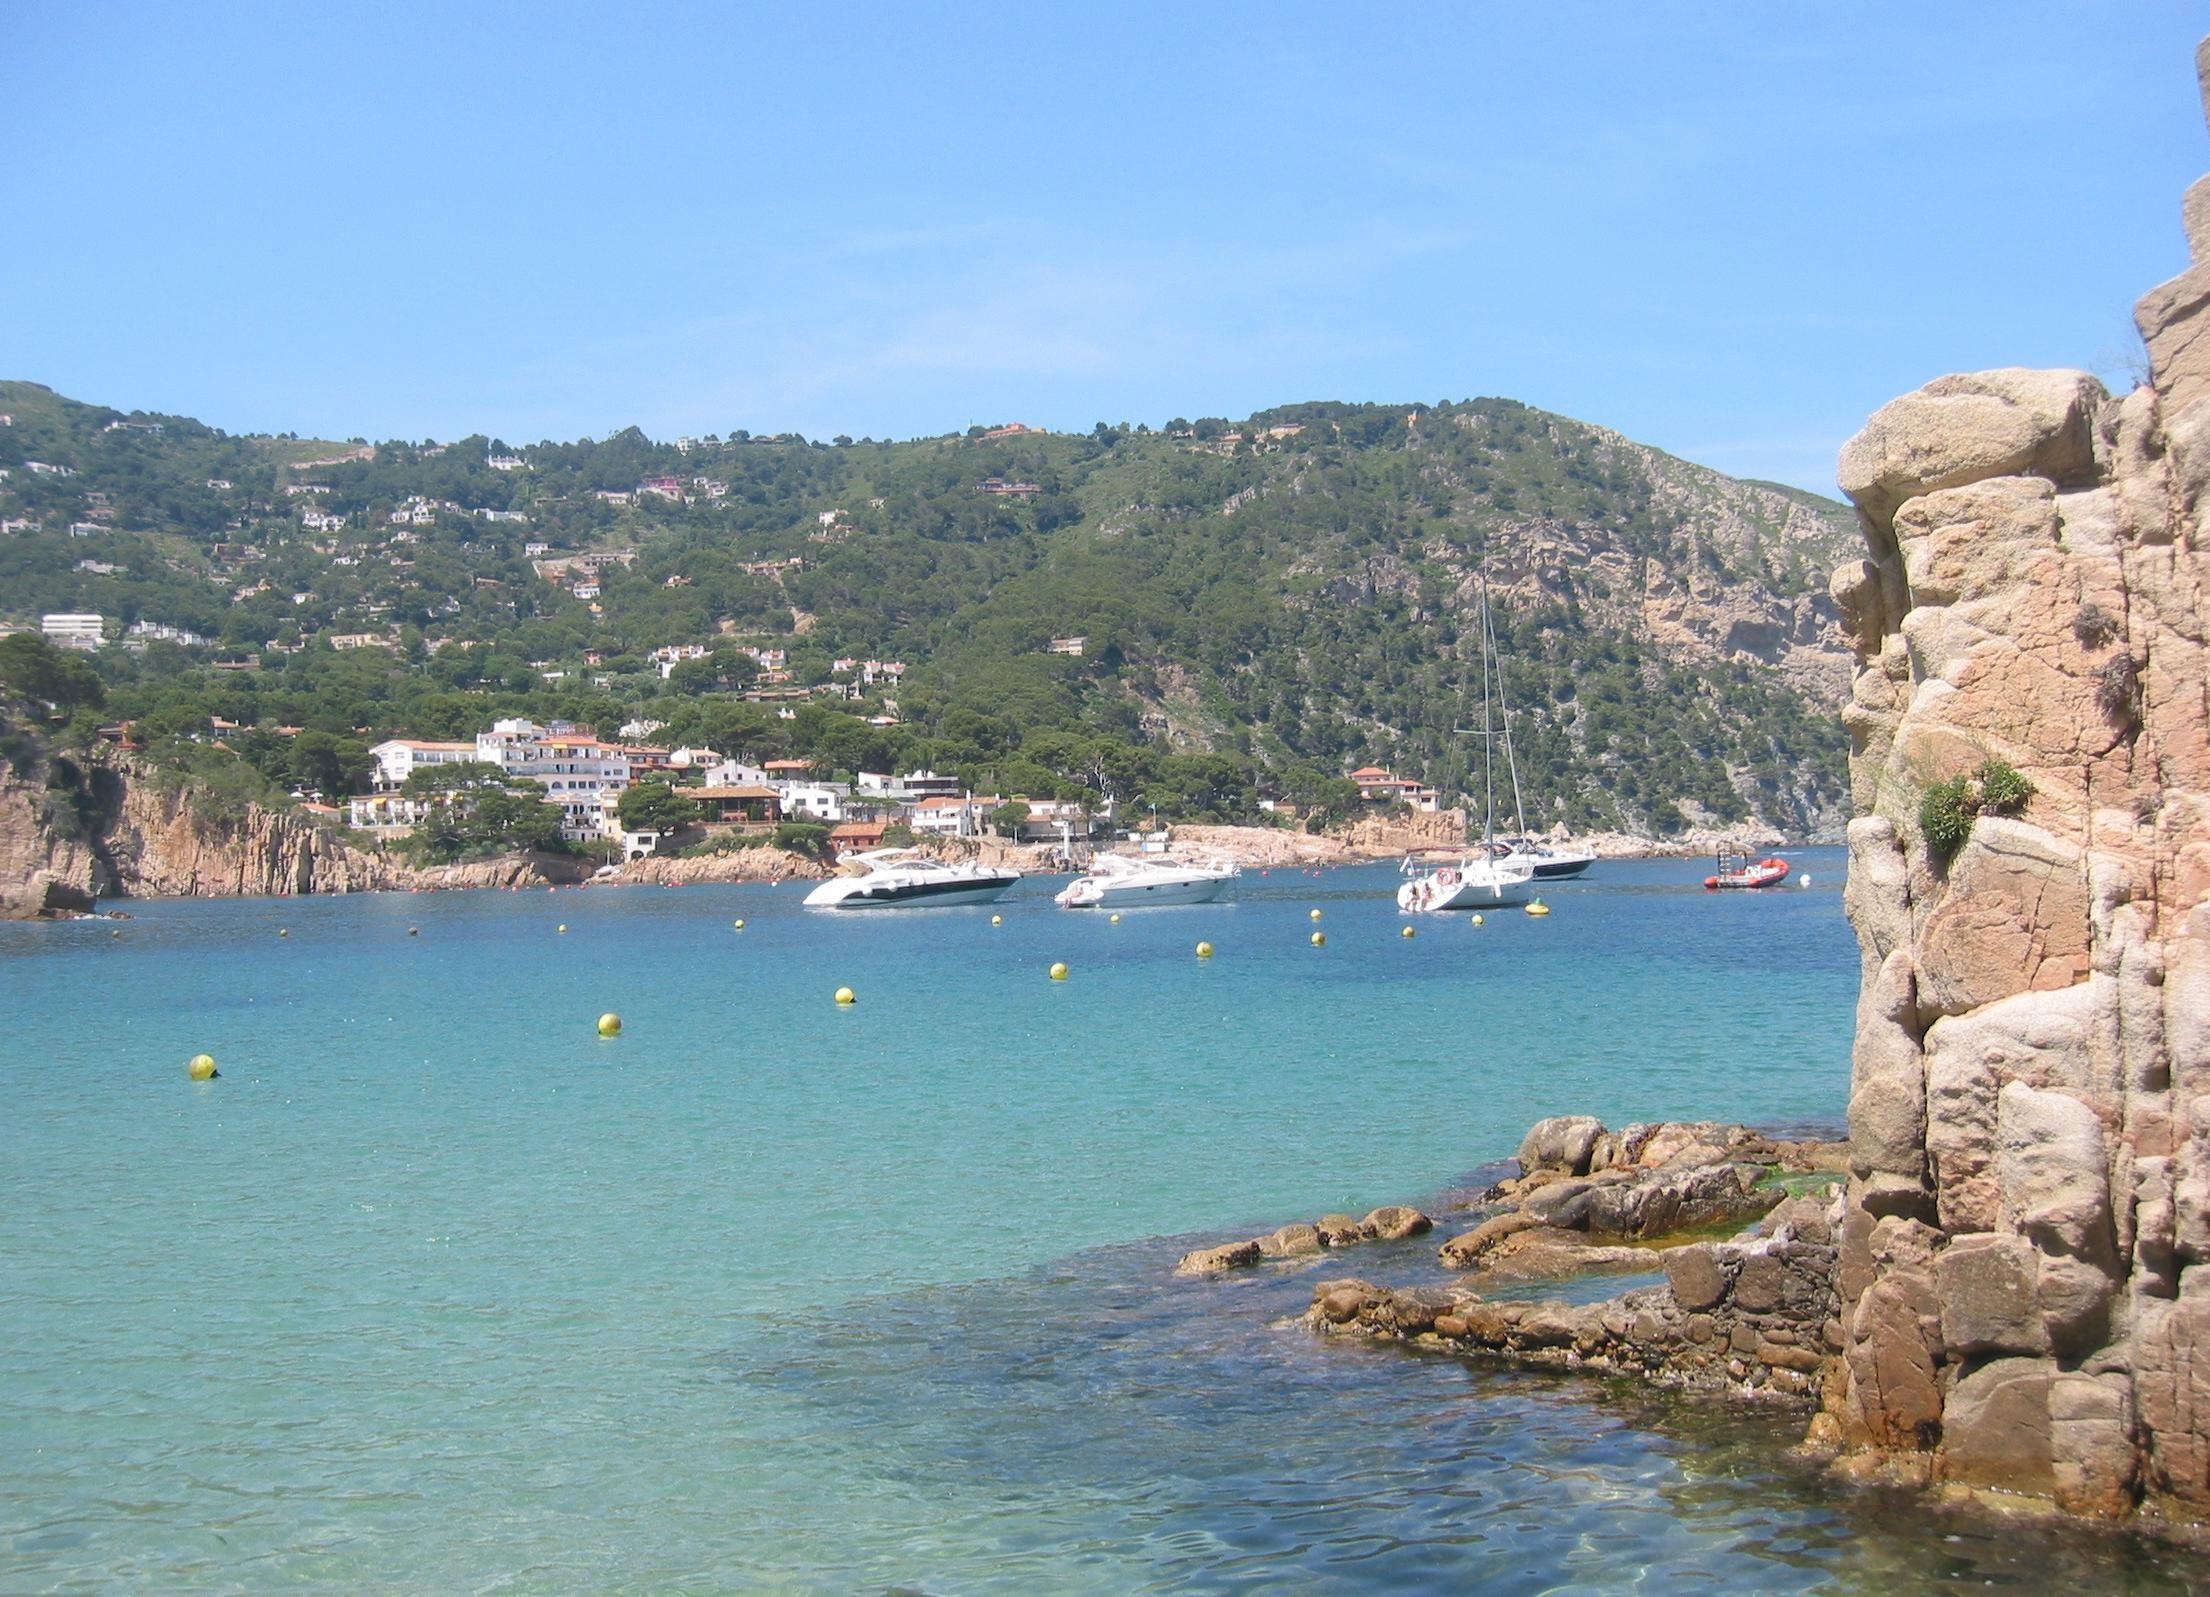 Aigua Blava Uma Pequena Baia Na Costa Brava Provincia De Girona Comunidade Autonoma Da Catalunha Espanha Perto De Begur E Palafr Viagens Espanha Catalunha